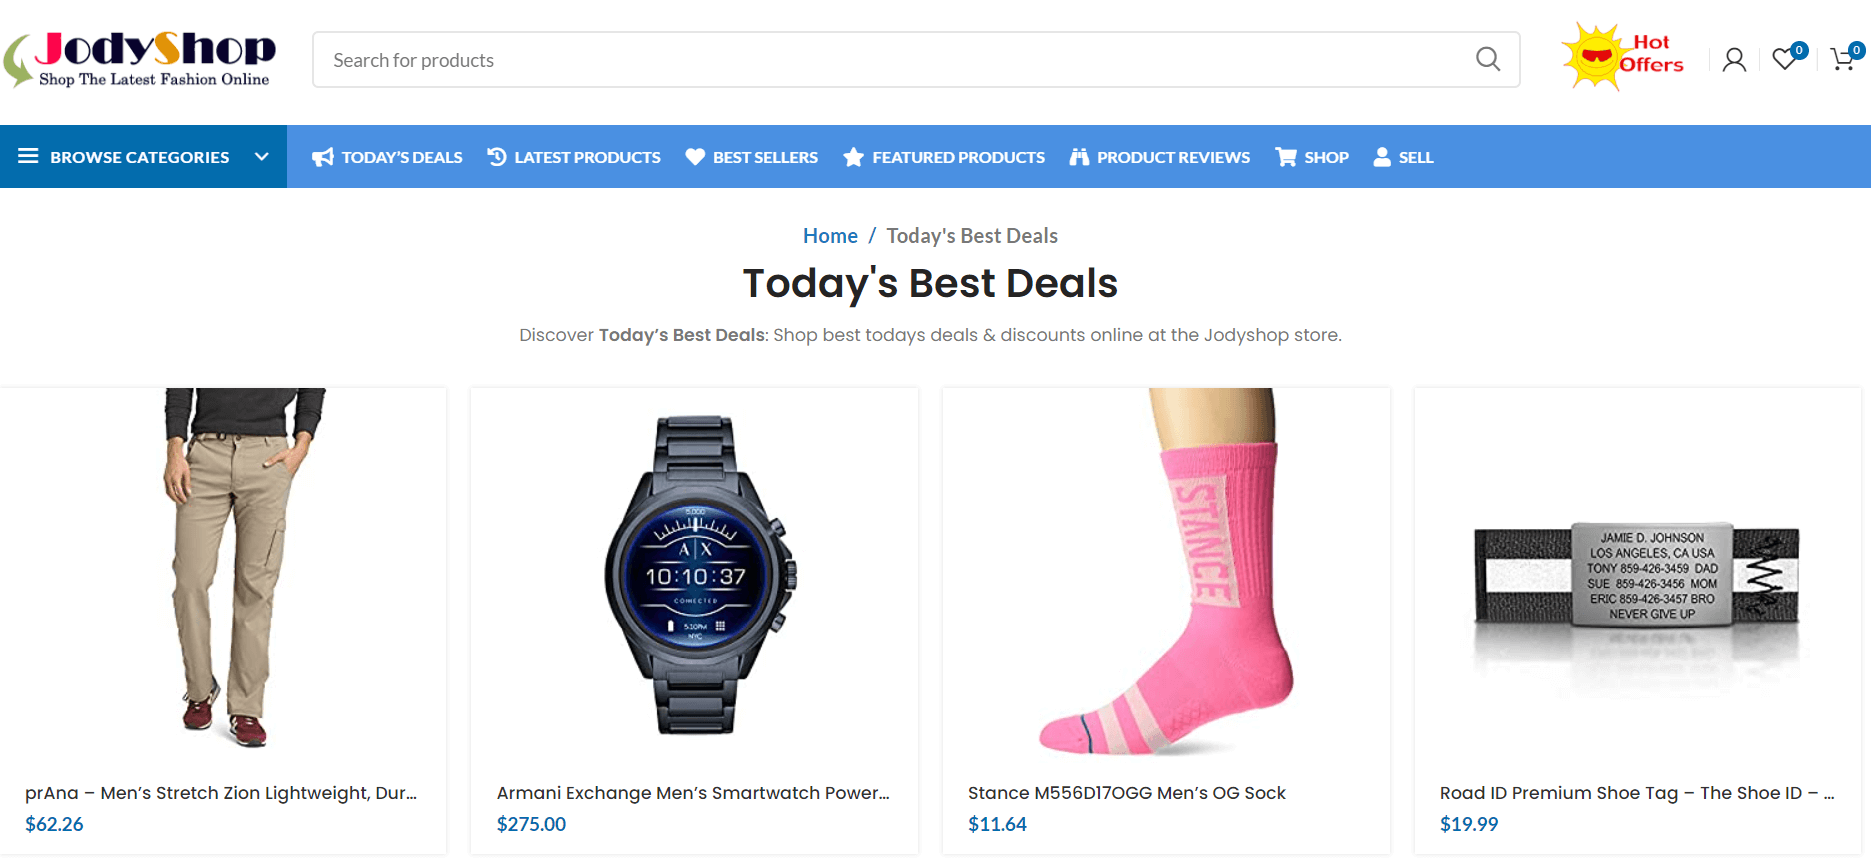 Jodyshop-todays-best-deal